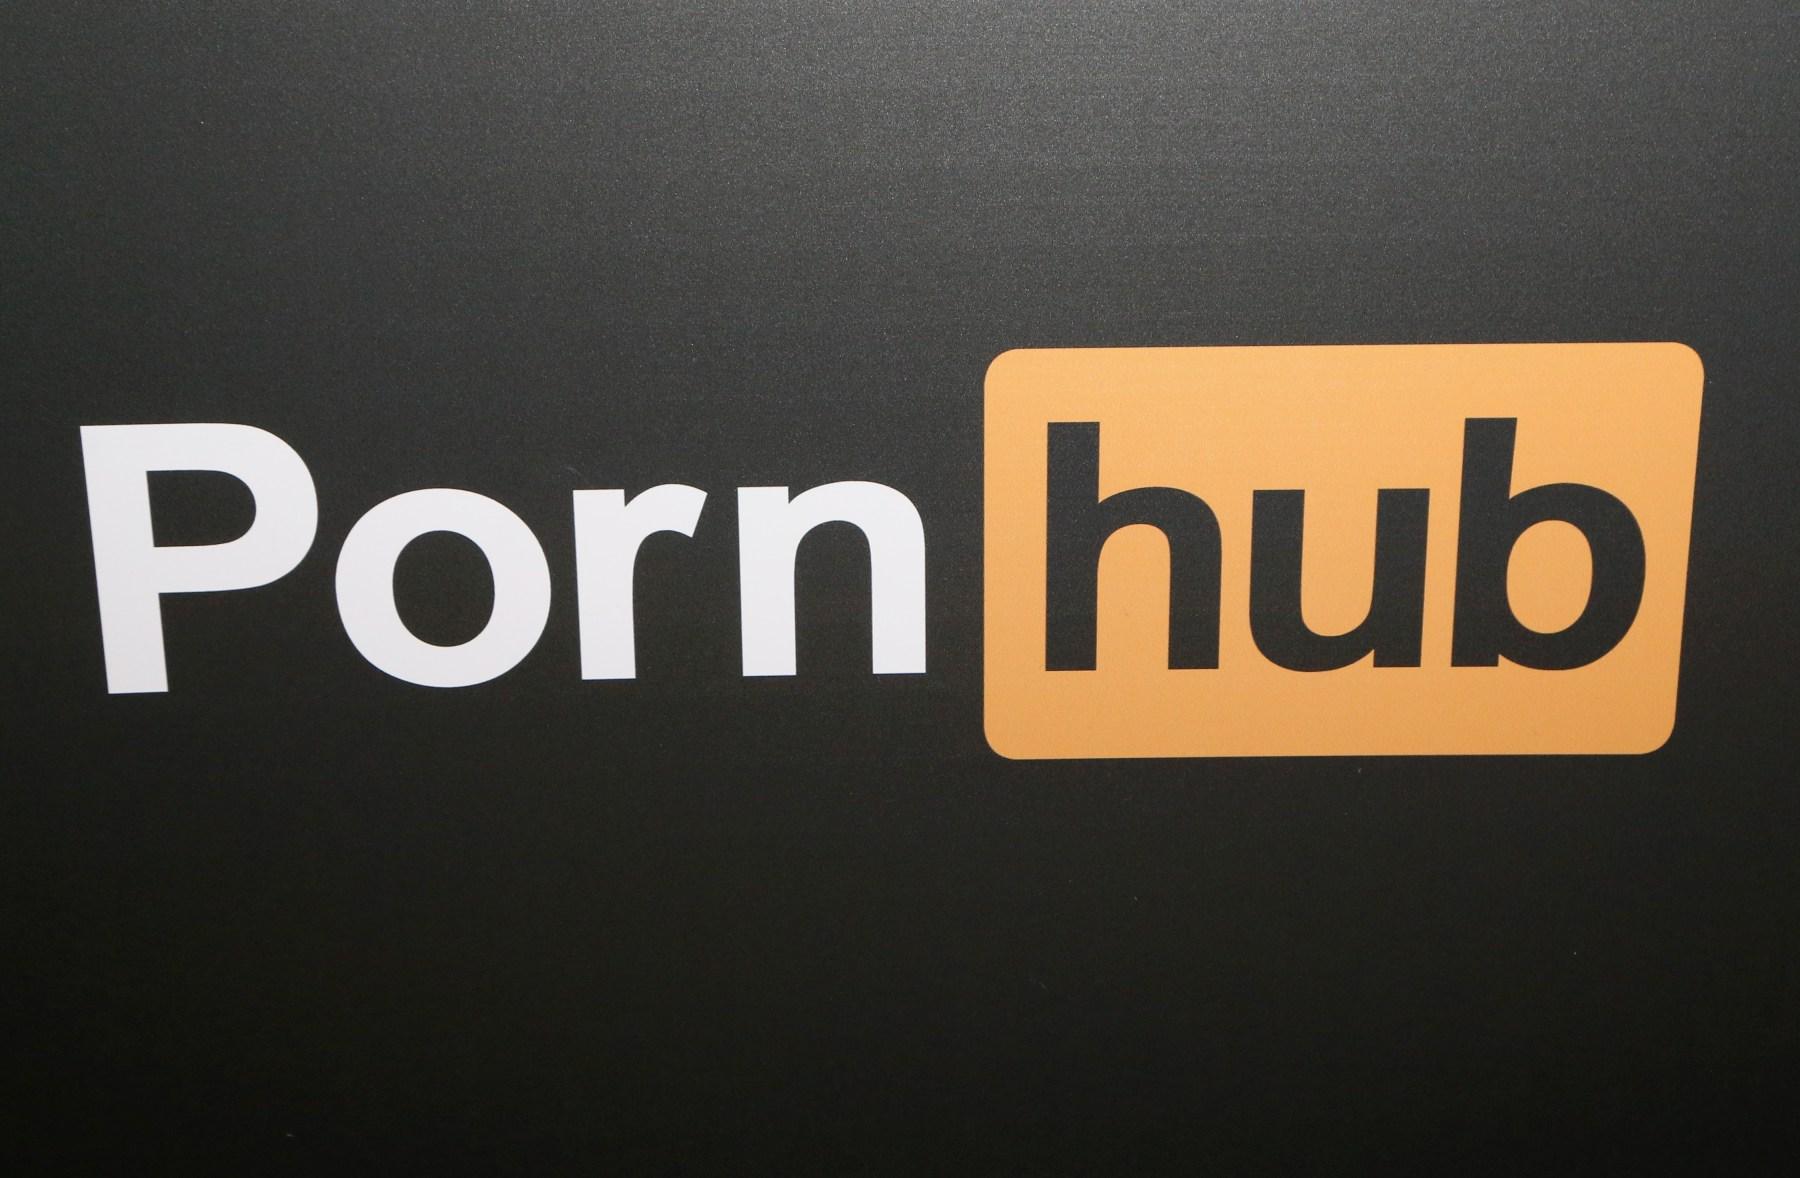 pornhub wants to bring